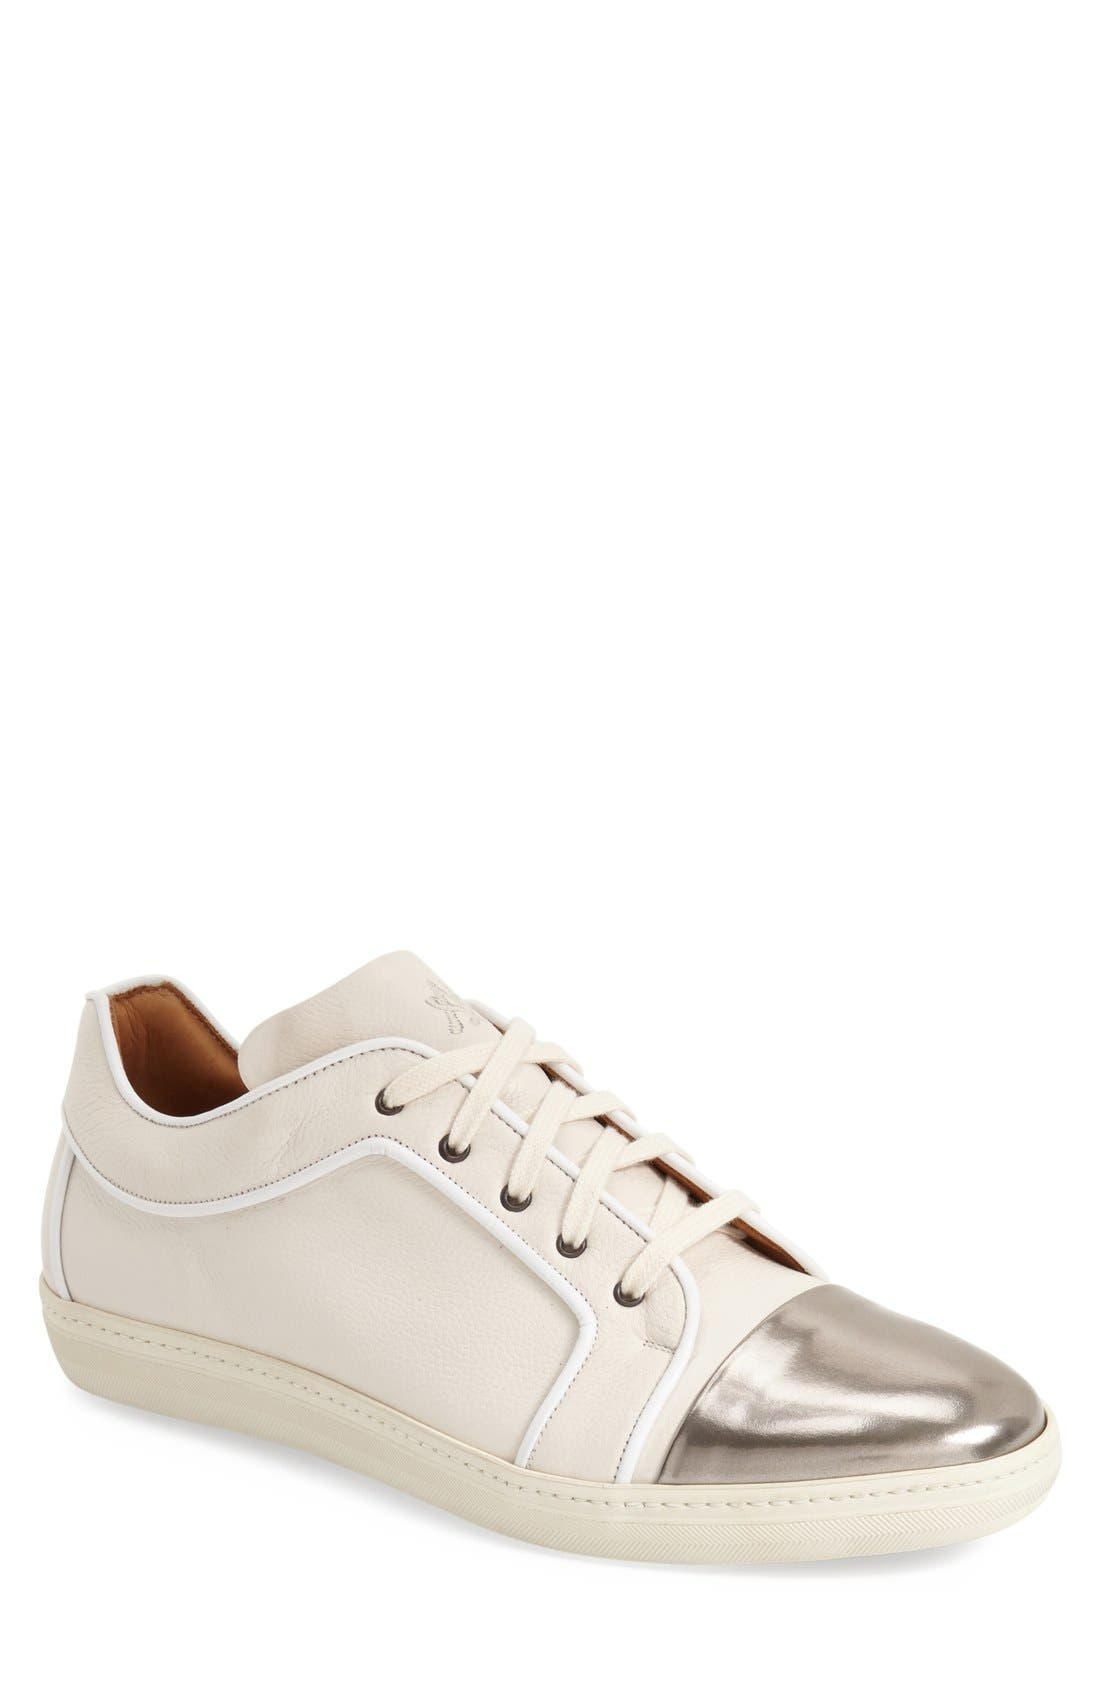 'Valeri' Sneaker,                         Main,                         color, 041